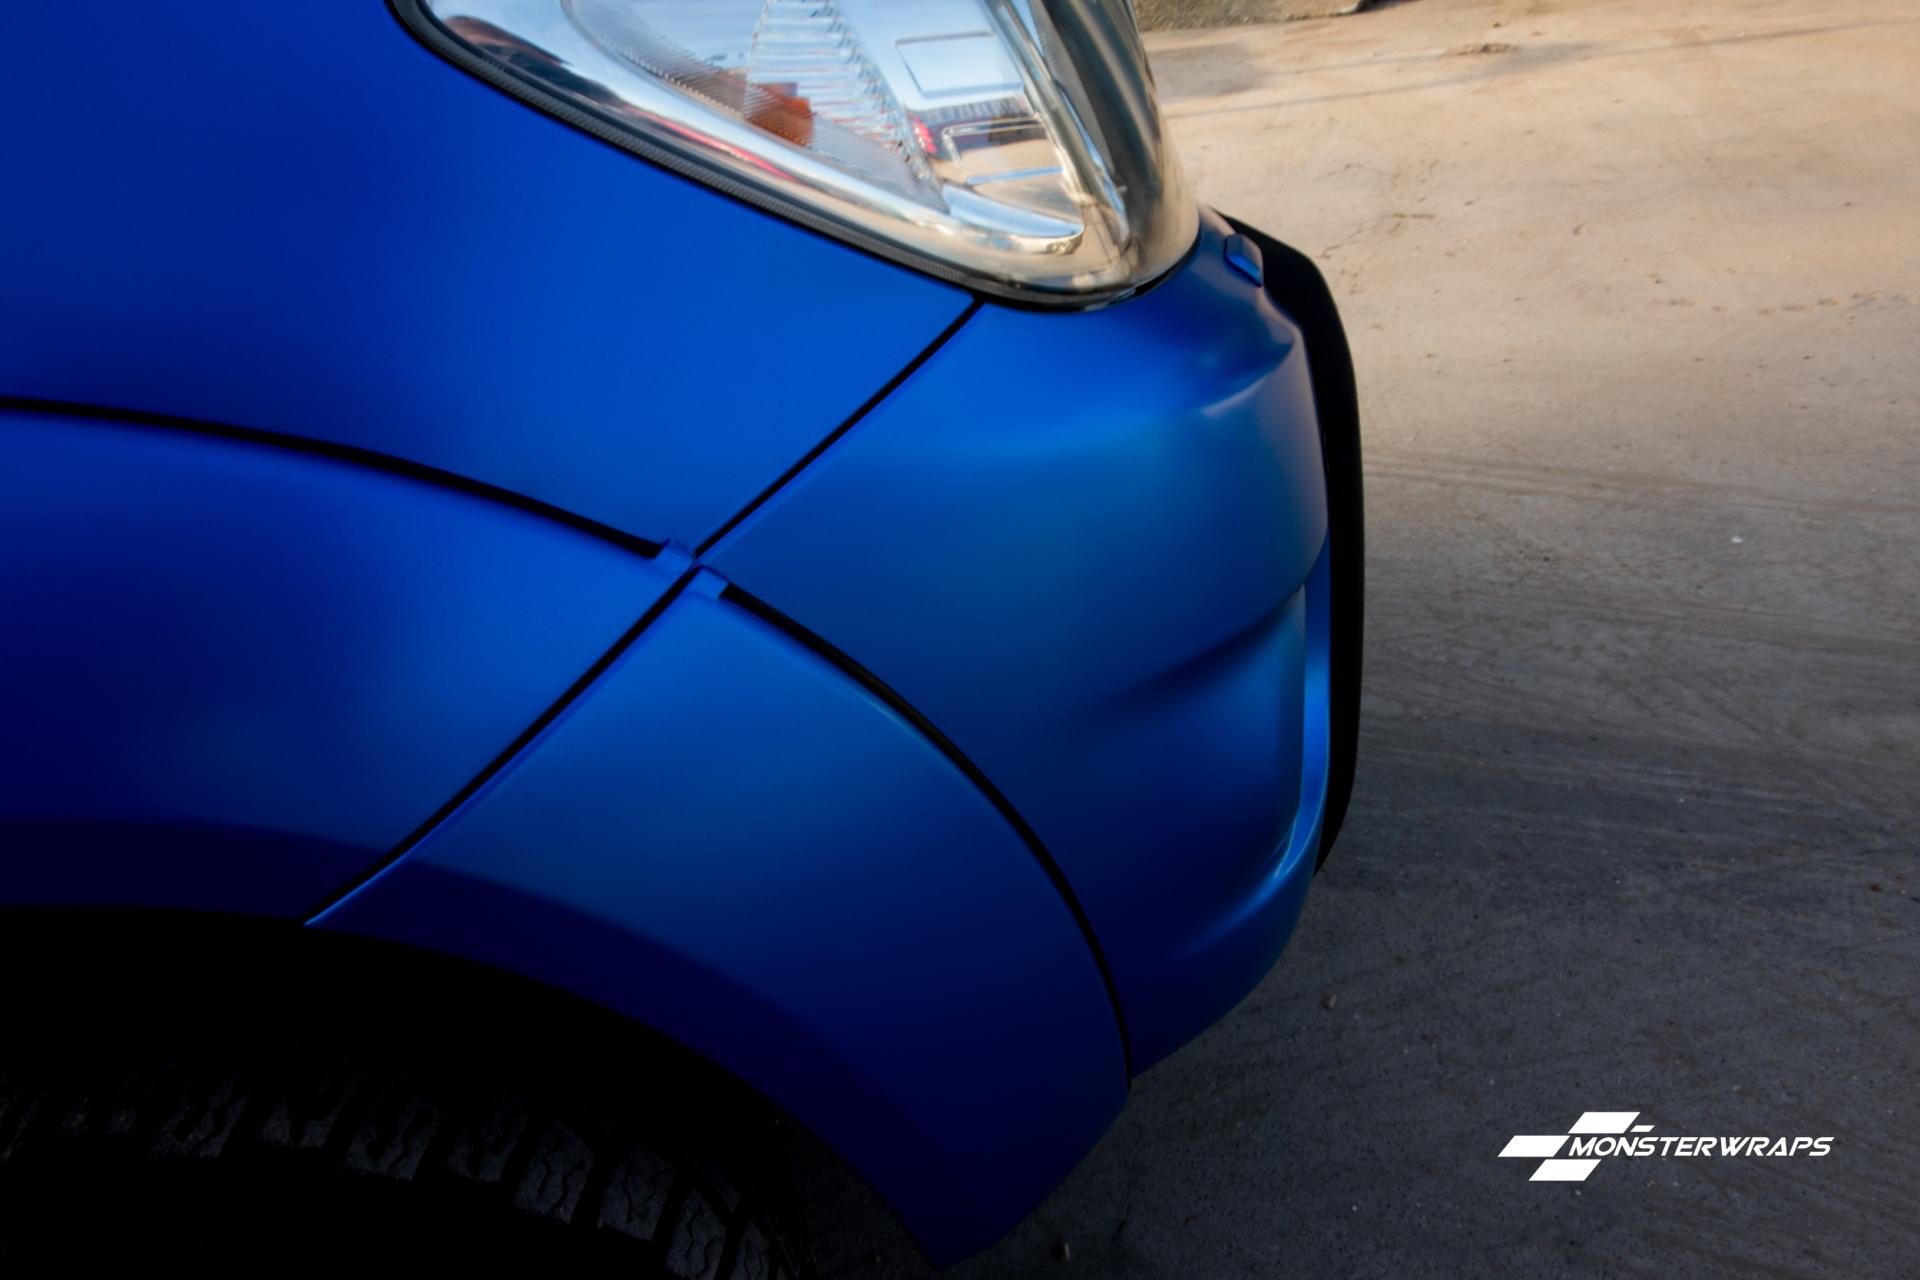 Toyota Hilux Satin Perfect Blue full wrap